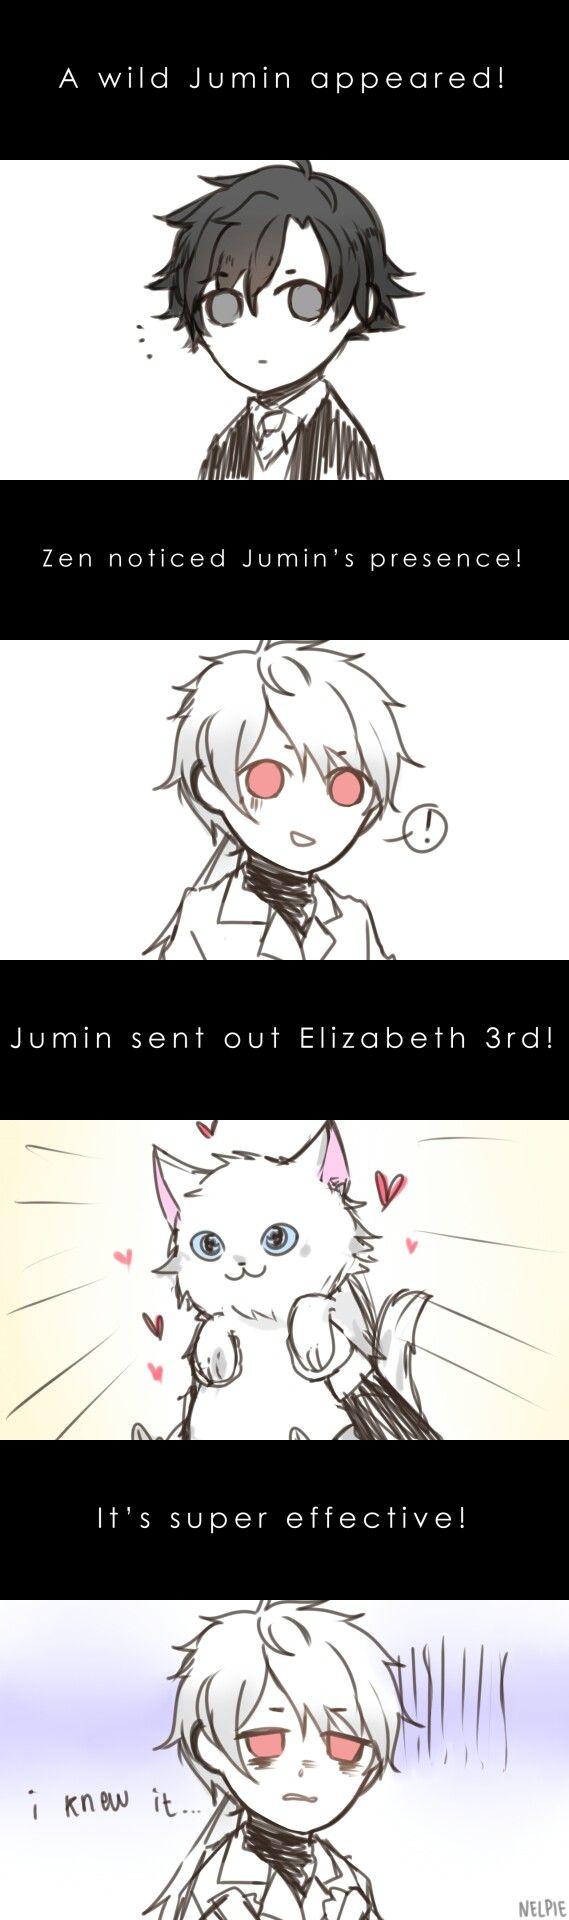 Me: Nice job Jumin!!*Highfives Jumin**Pats Zen on the head* I'm sorry Zen.I like cats so... Yeah... Your still adorable though!!!!